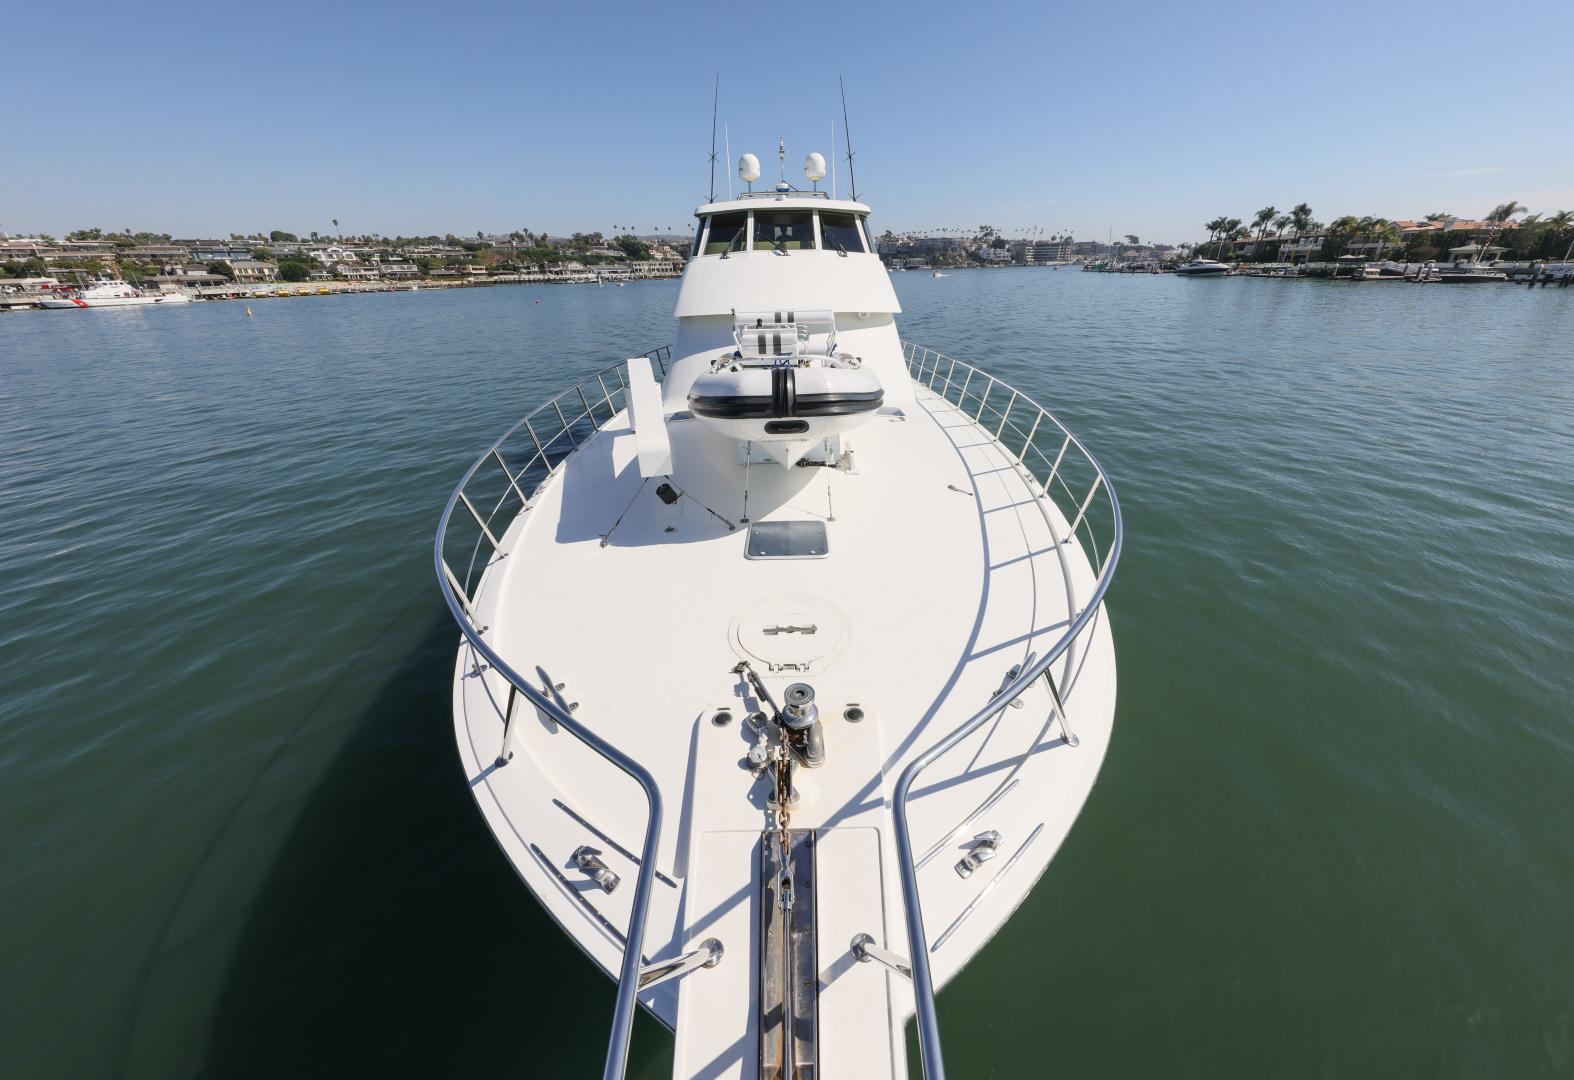 Hatteras-Convertible 1995-LADY LILA Newport Beach-California-United States-BOW-1516285 | Thumbnail